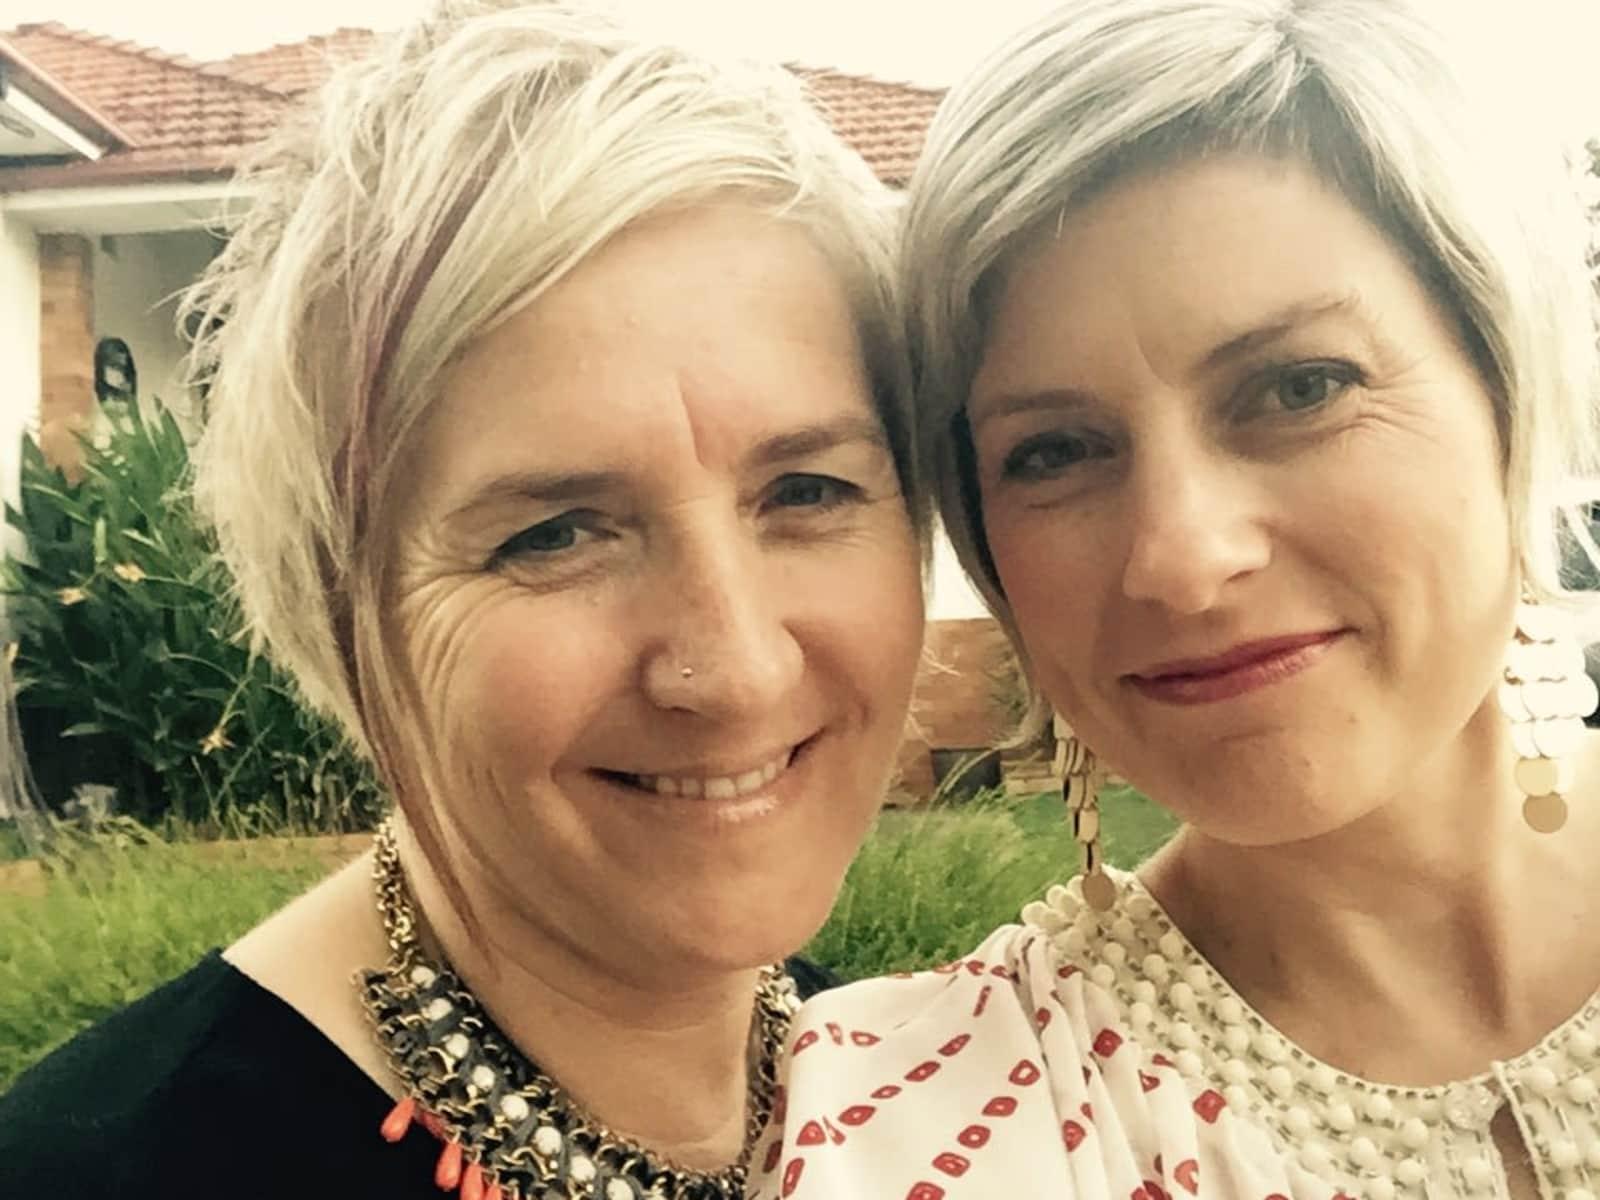 Jess & Joanne from Brisbane, Queensland, Australia